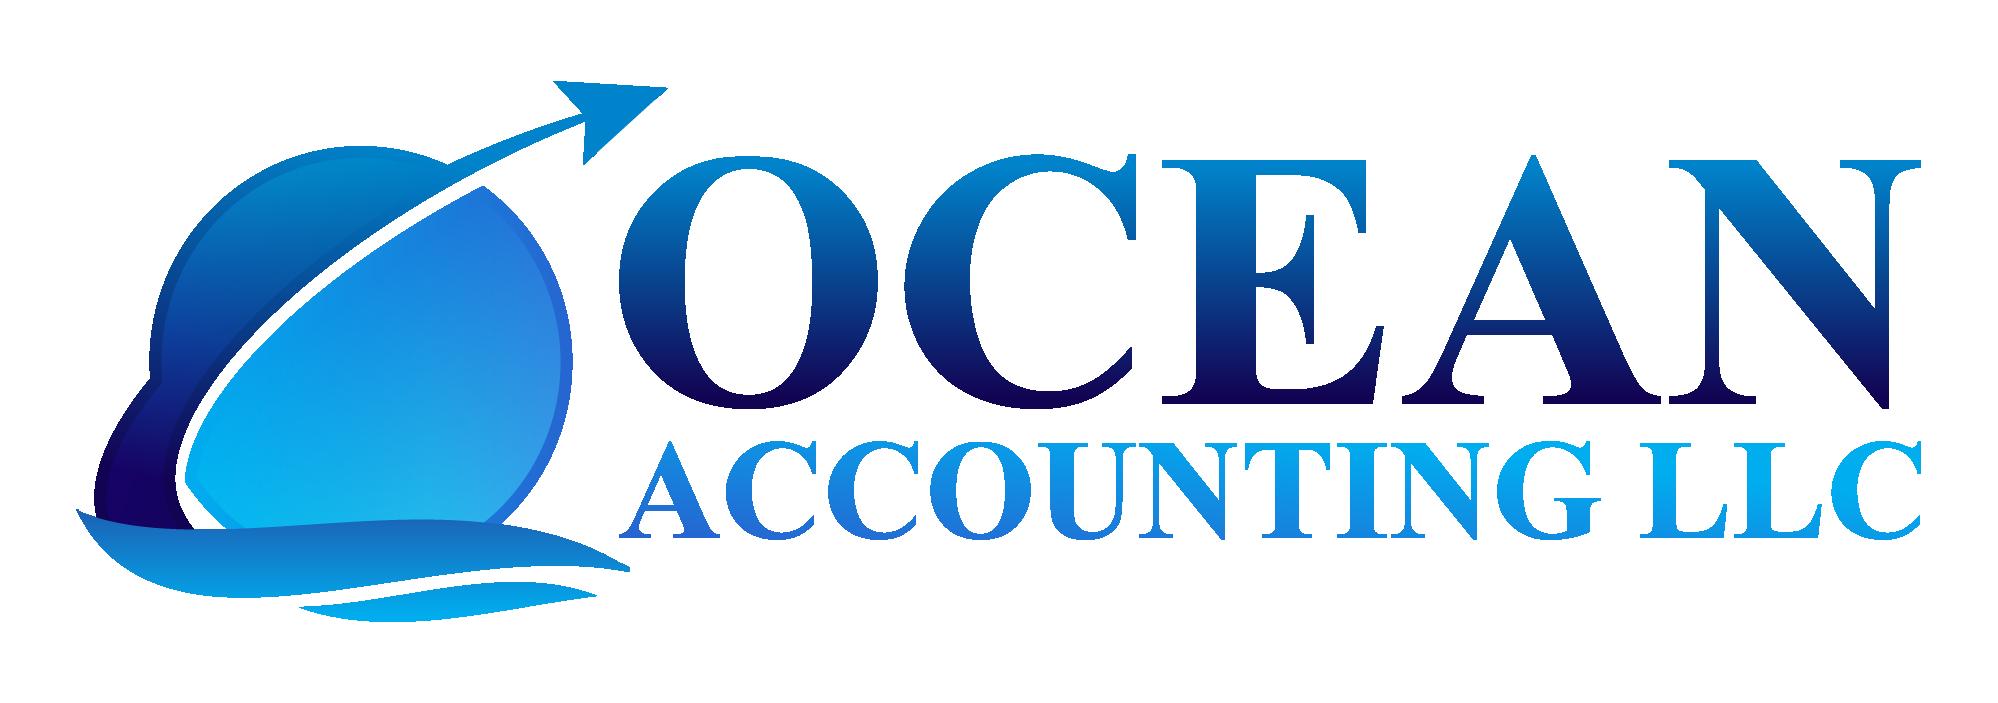 OCEAN ACCOUNTING LLC